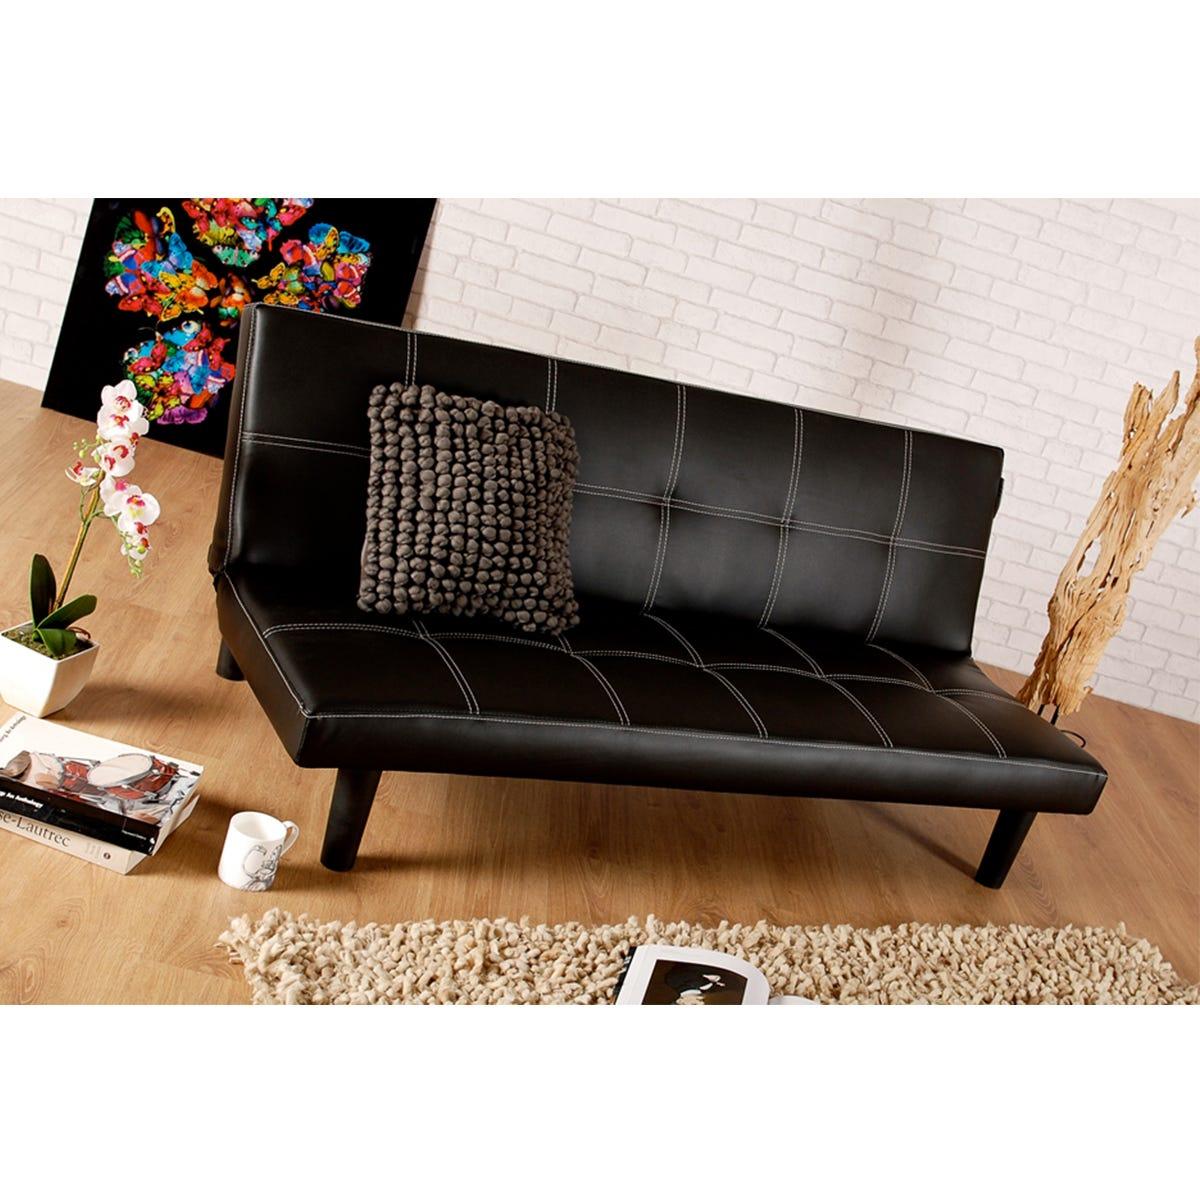 Brisbane Sofa Bed - Black